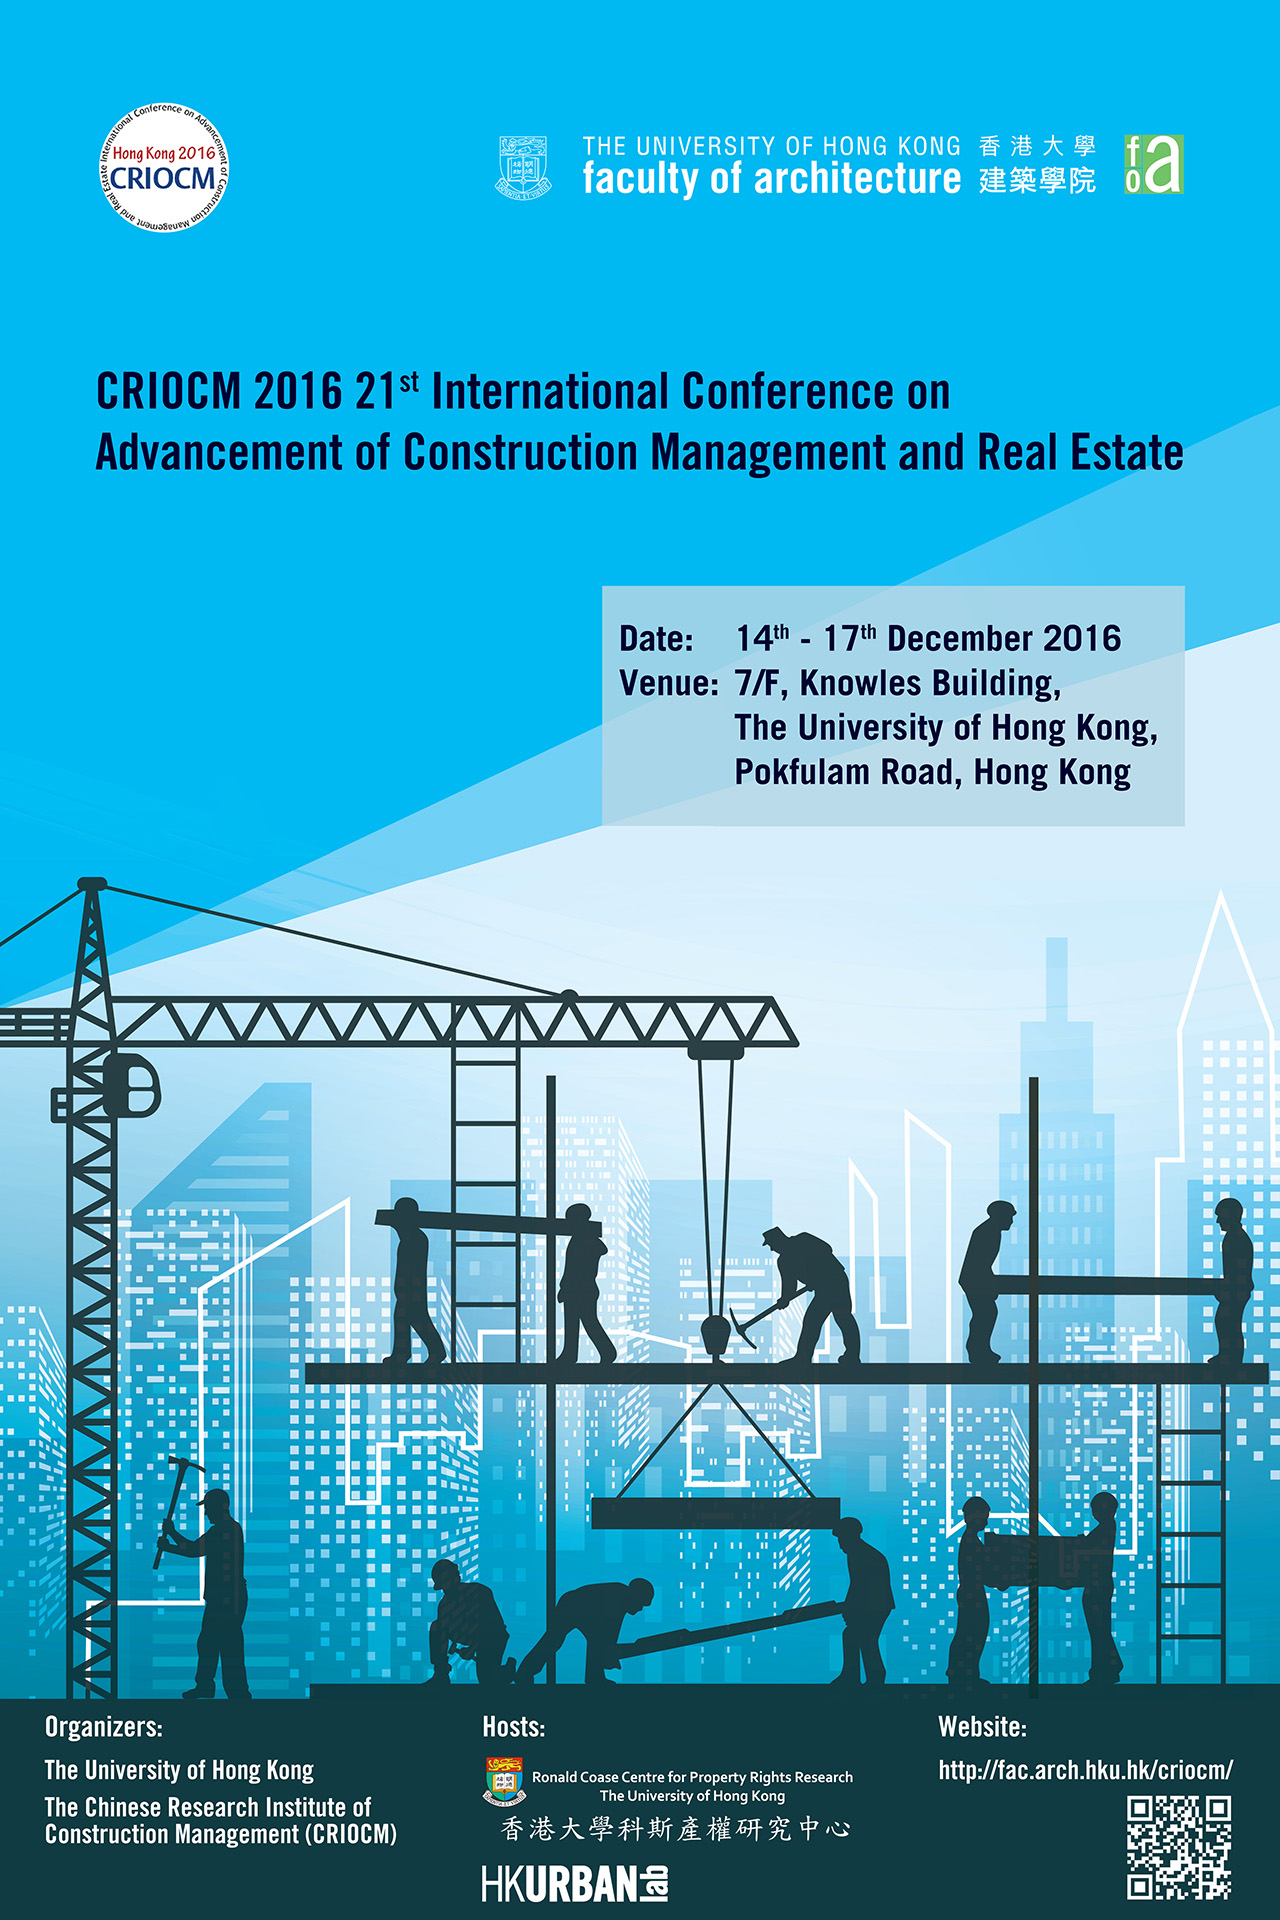 criocm 2016 21st international conference on advancement